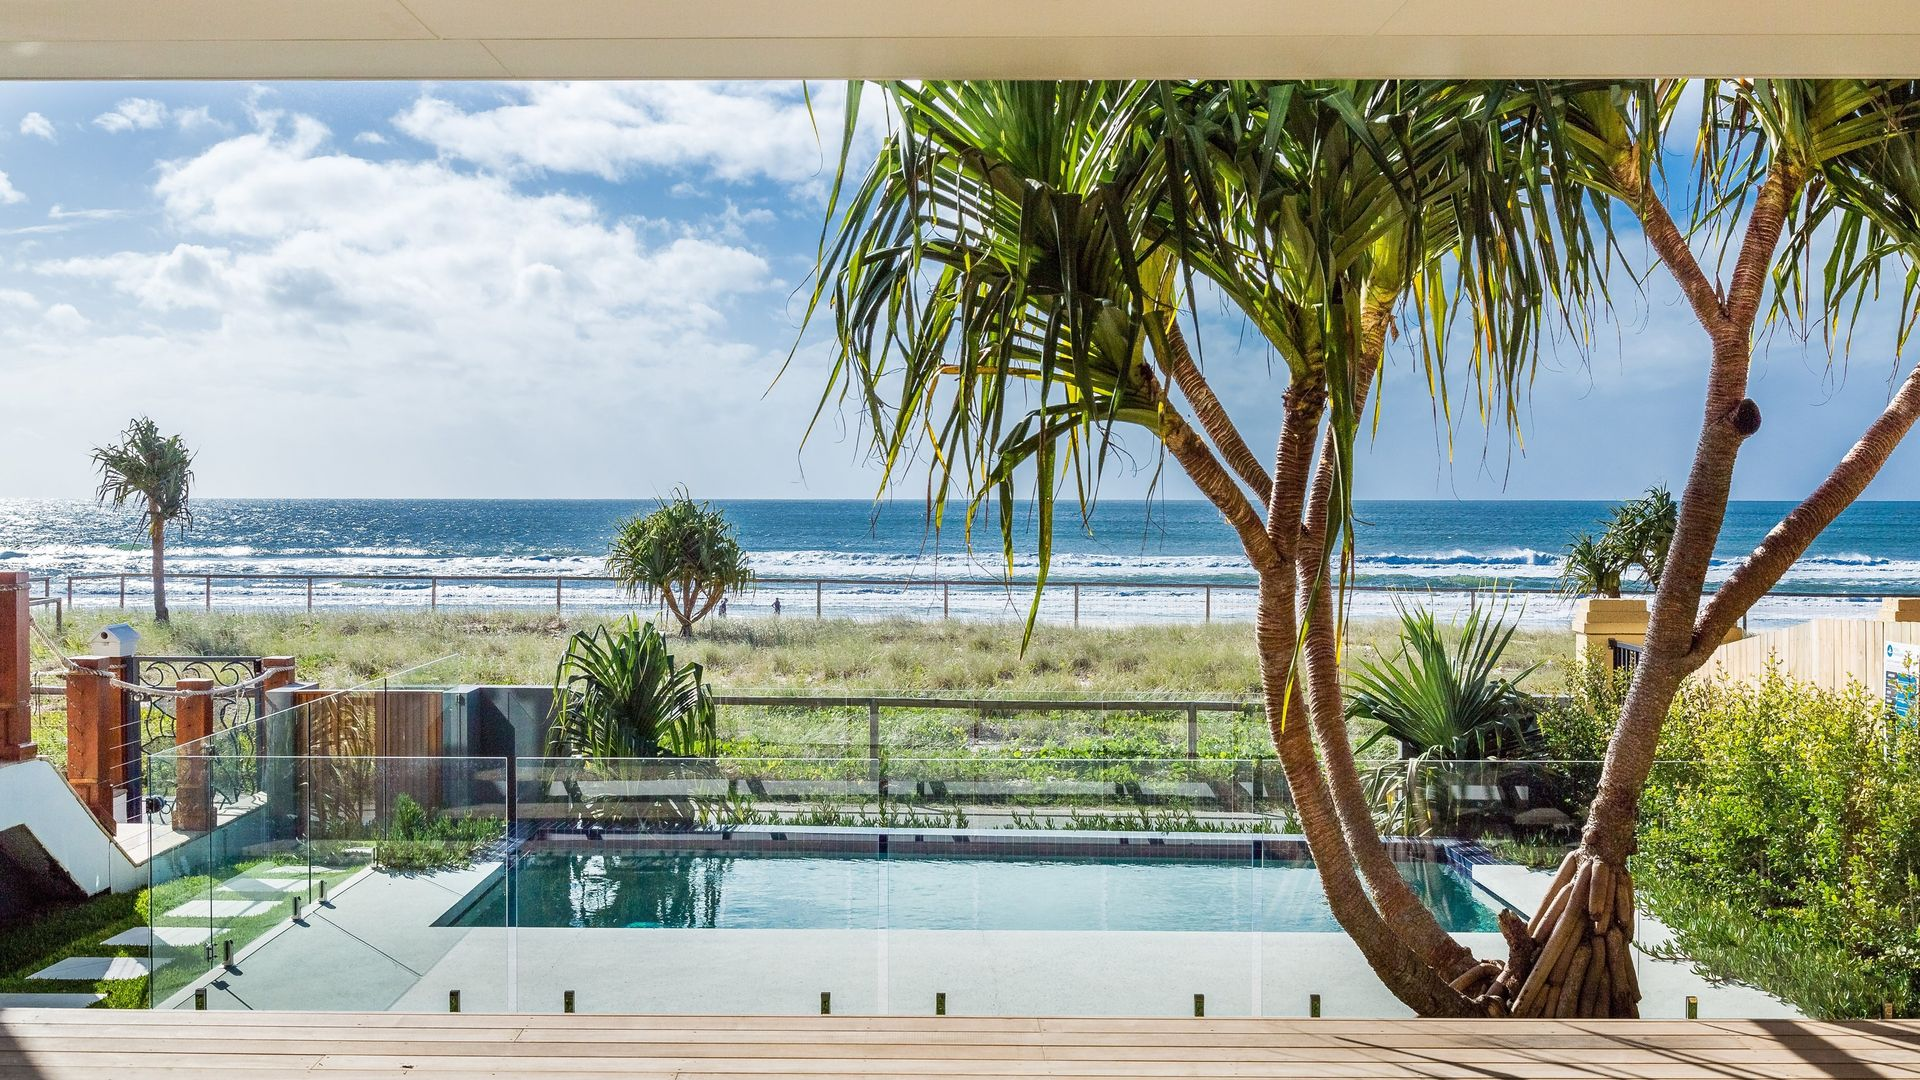 504 The Esplanade, Palm Beach QLD 4221, Image 1